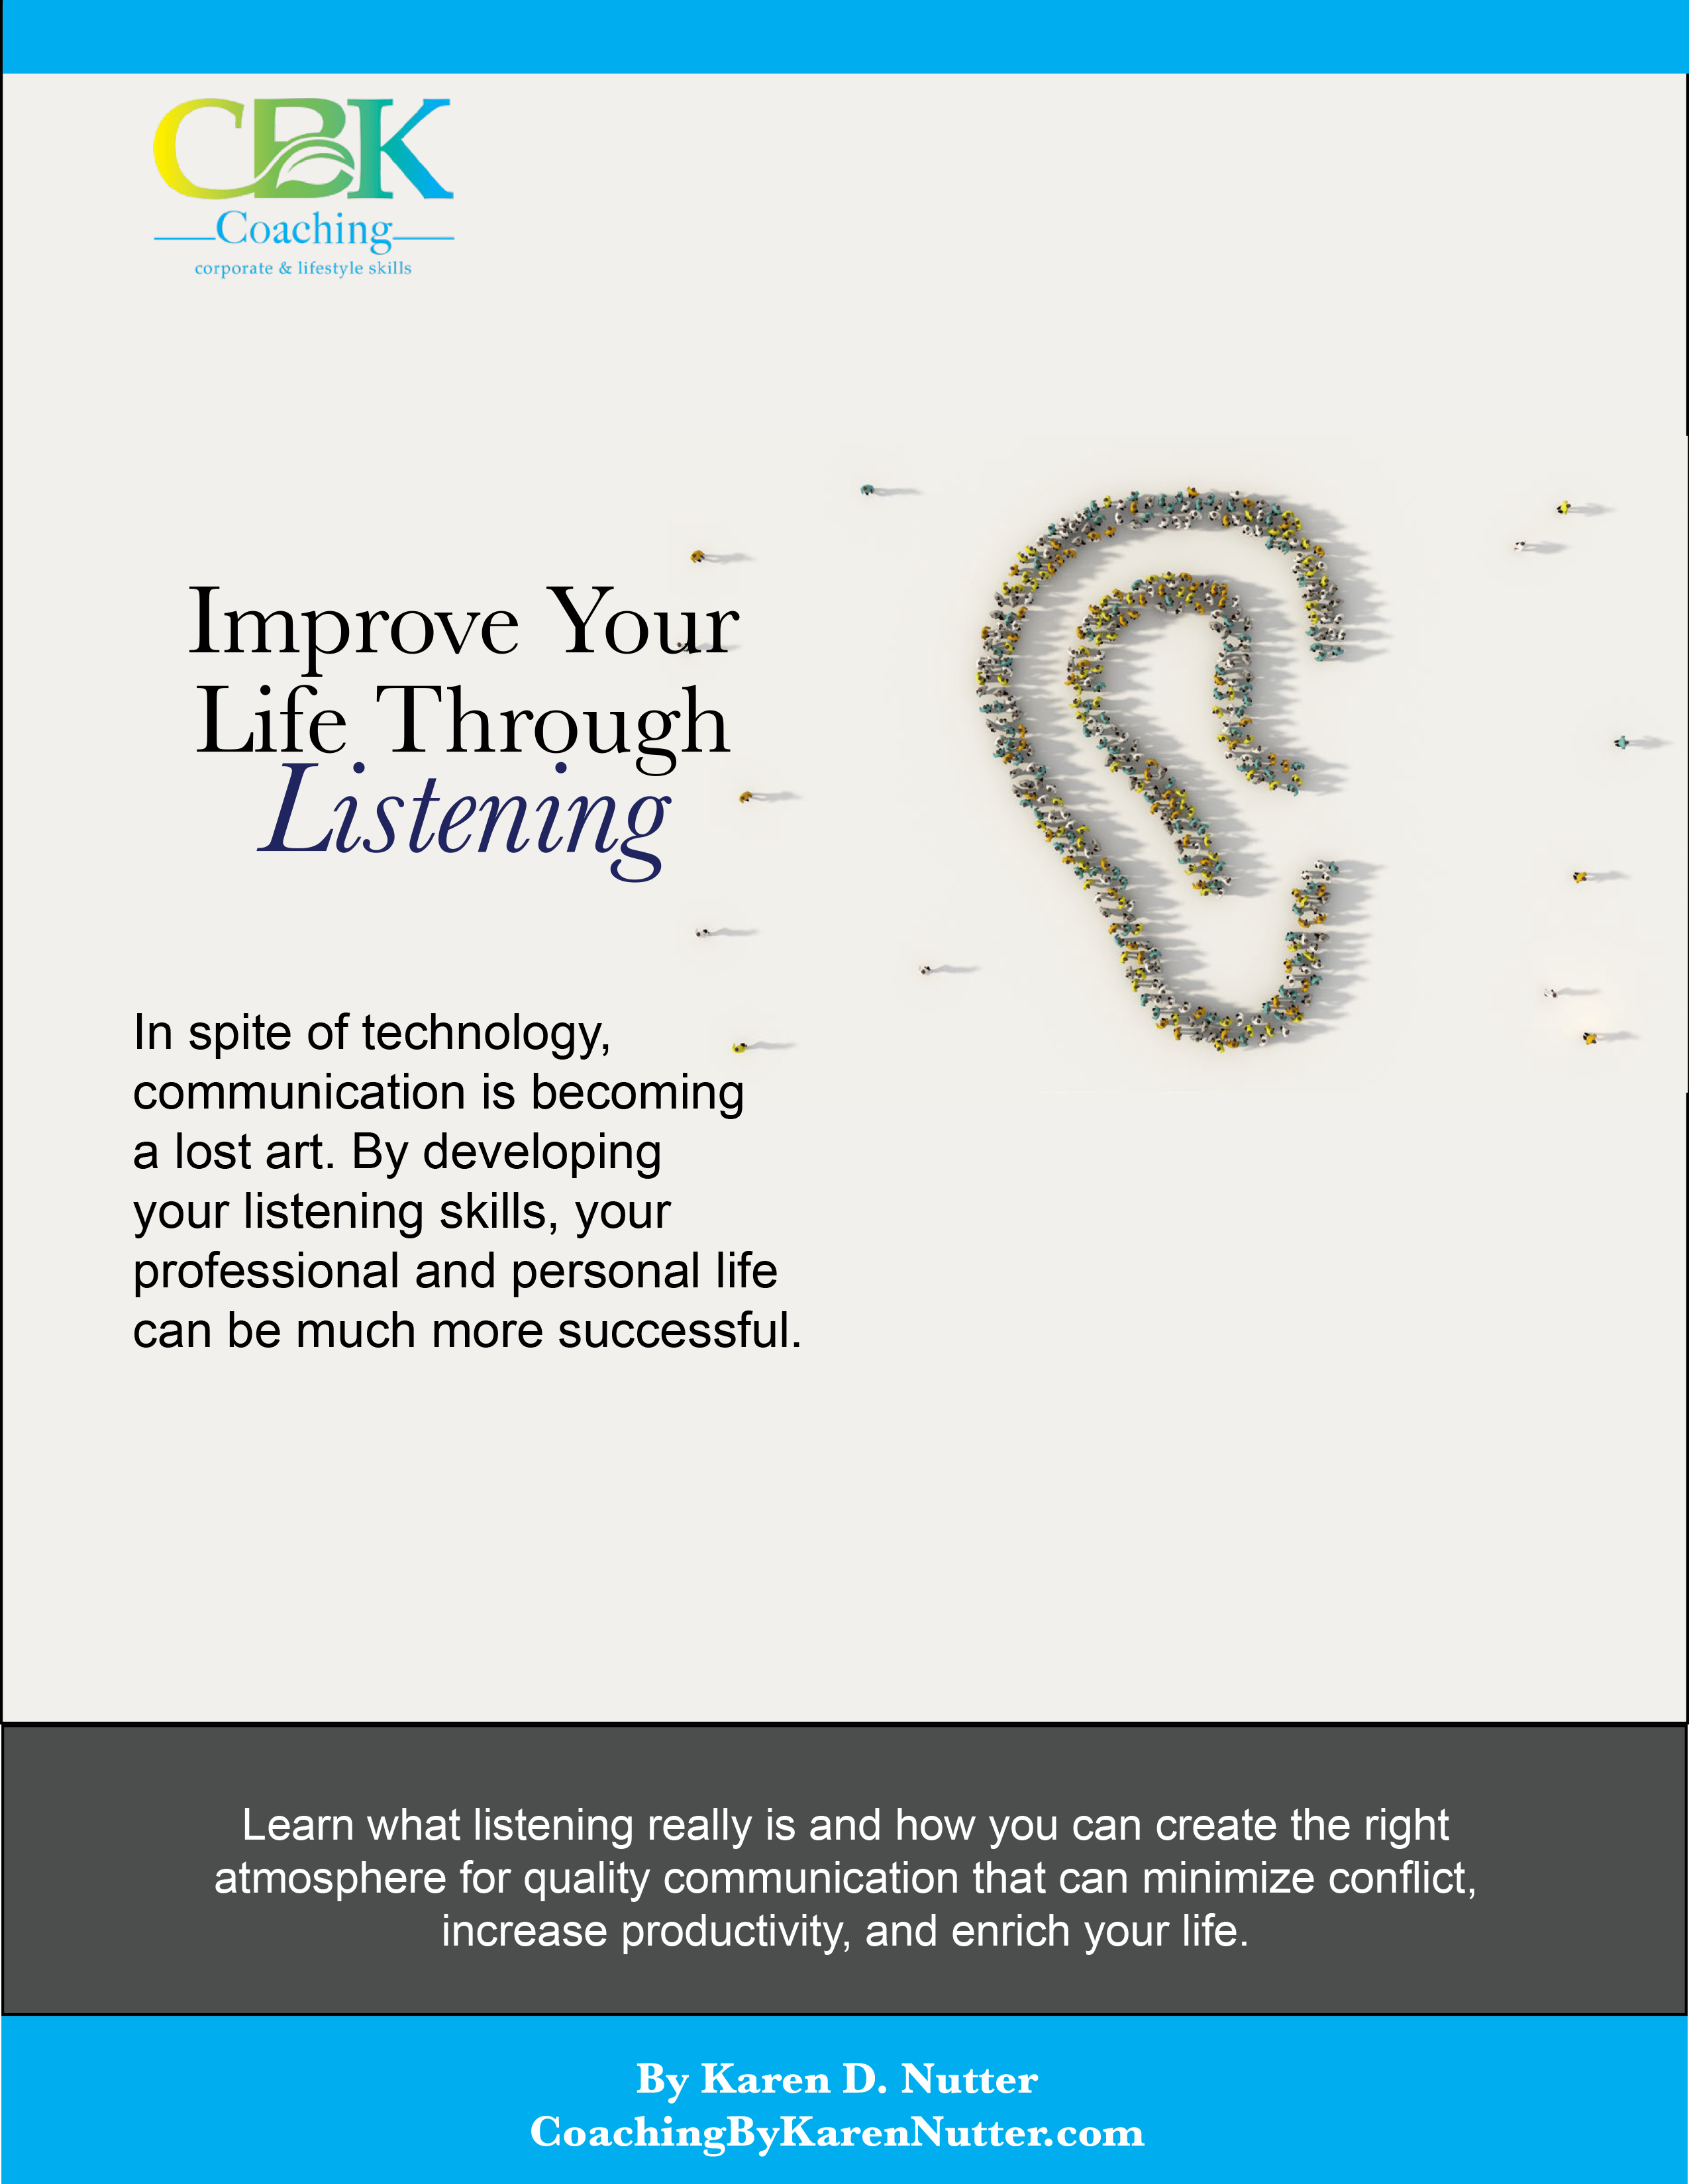 CBK-2020-Improve-Life-Through-Listening-1